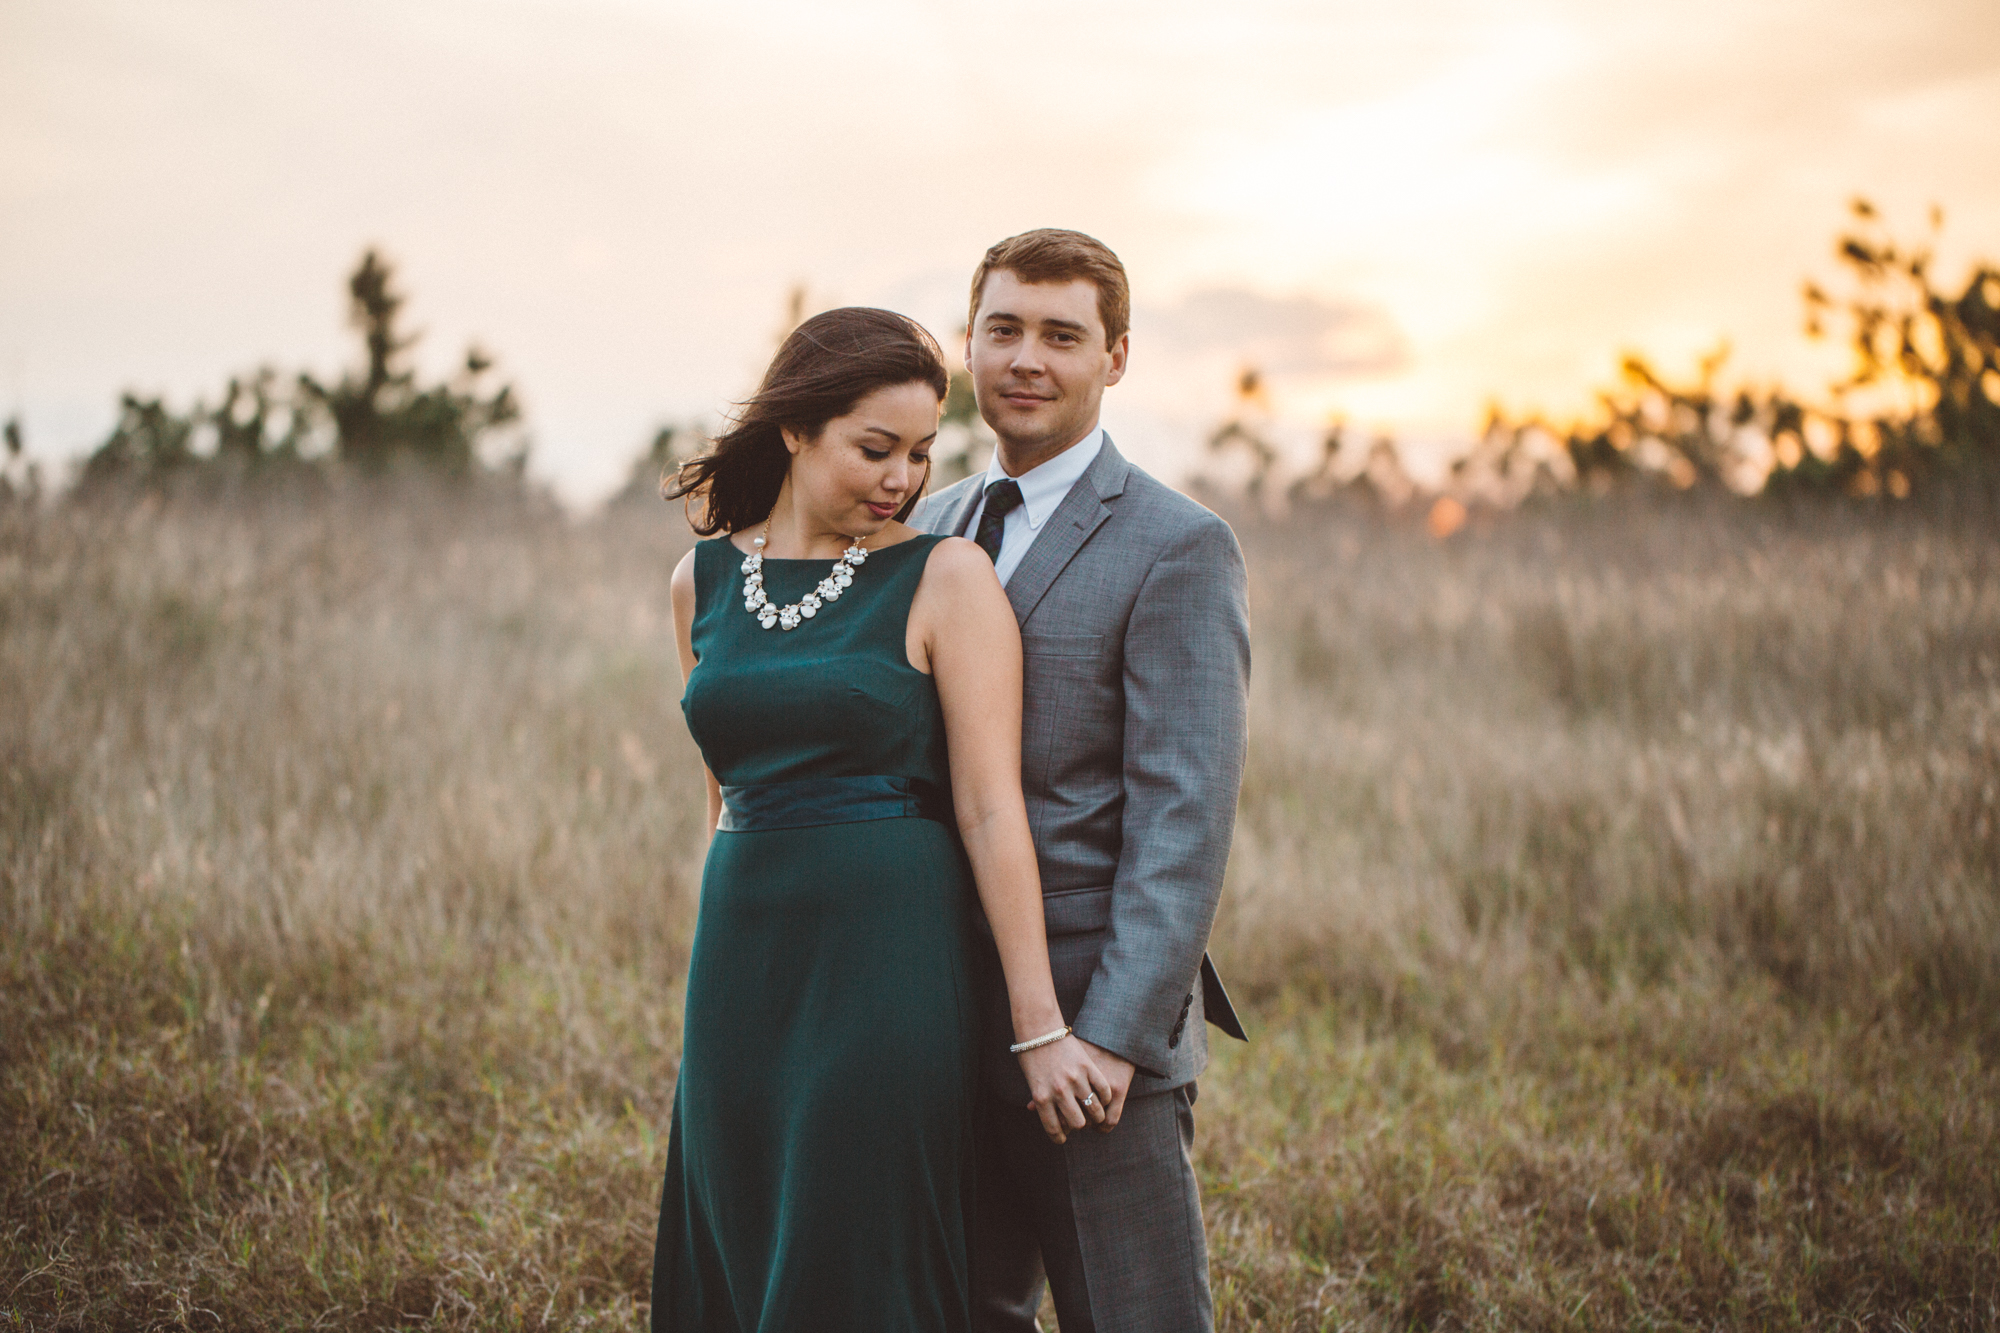 Orlando Engagement Photographer-76.jpg